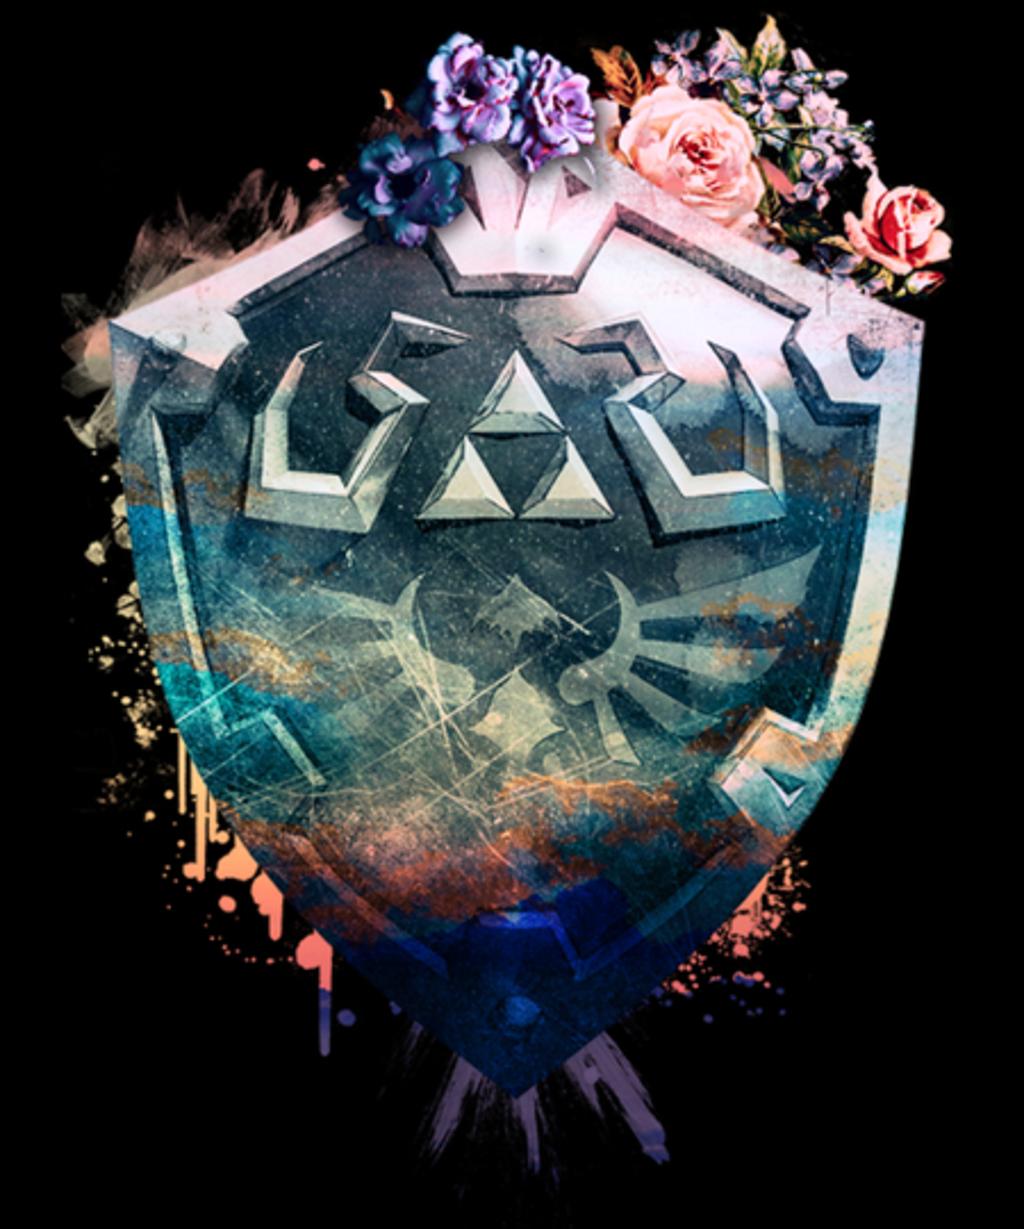 Qwertee: Floral Shield